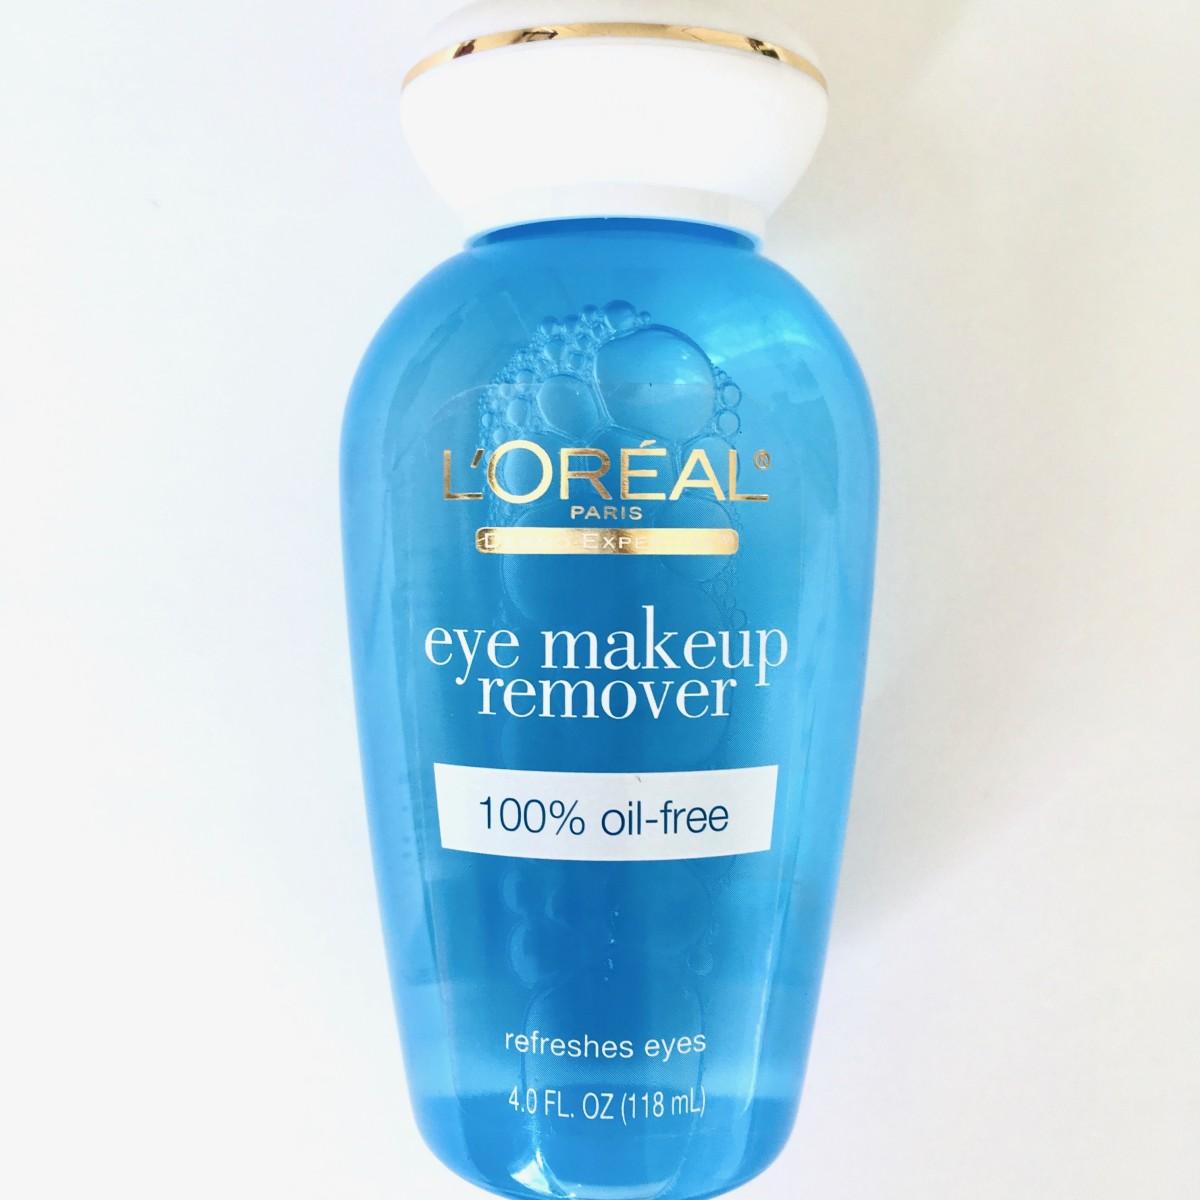 L'Oreal Paris Oil-Free Eye Makeup Remover